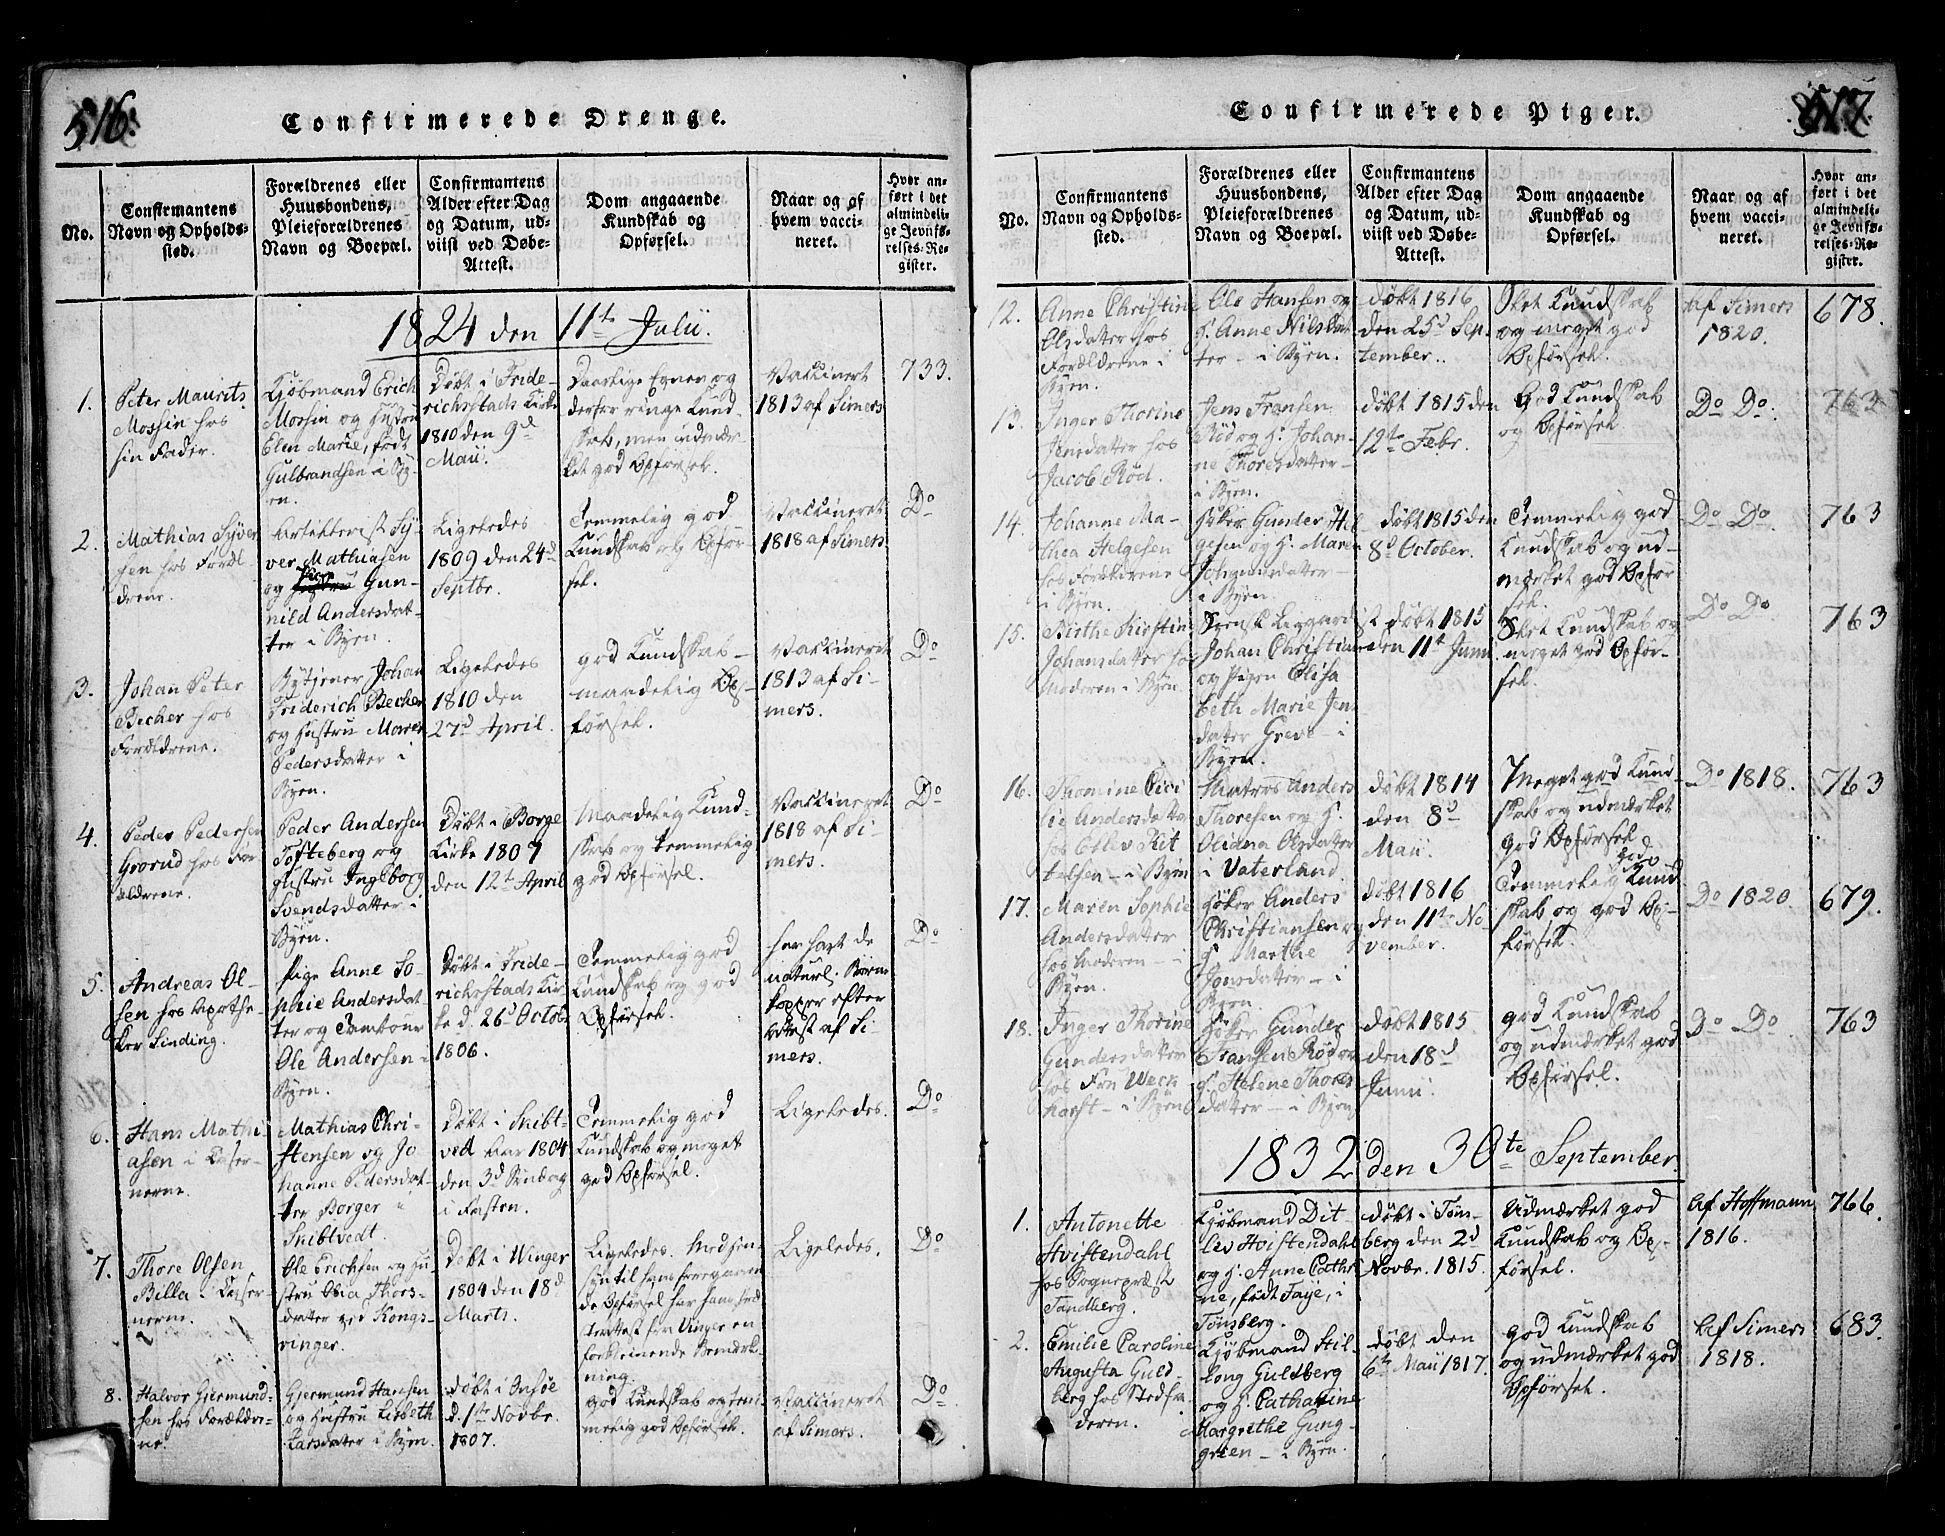 SAO, Fredrikstad prestekontor Kirkebøker, F/Fa/L0004: Ministerialbok nr. 4, 1816-1834, s. 516-517